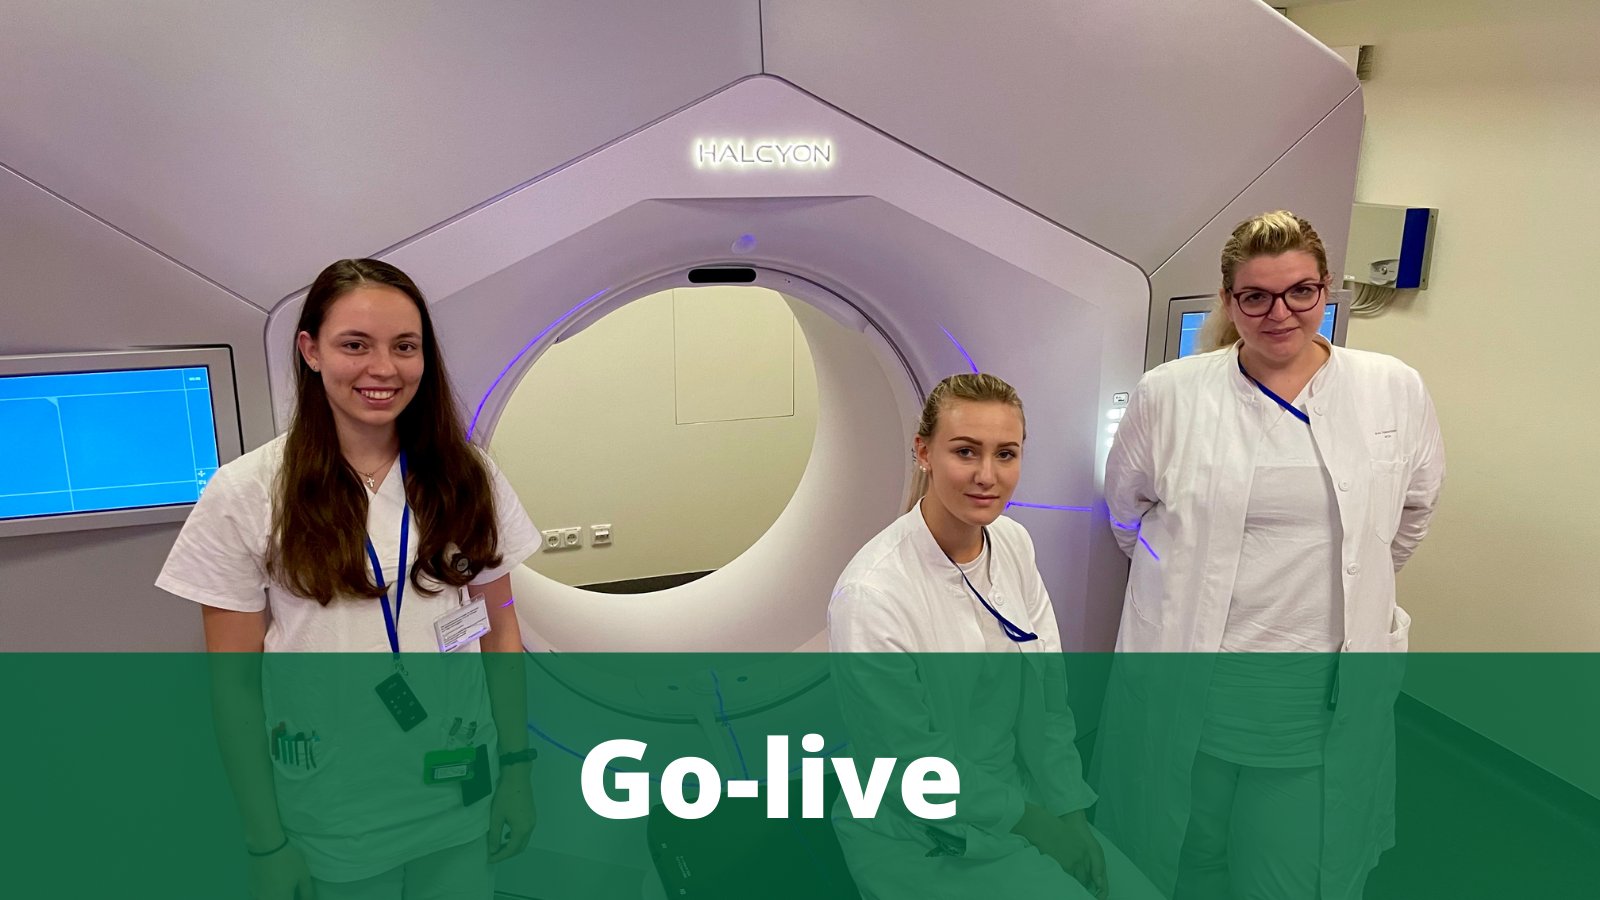 Universitätsklinikum Erlangen go live with AlignRT InBore